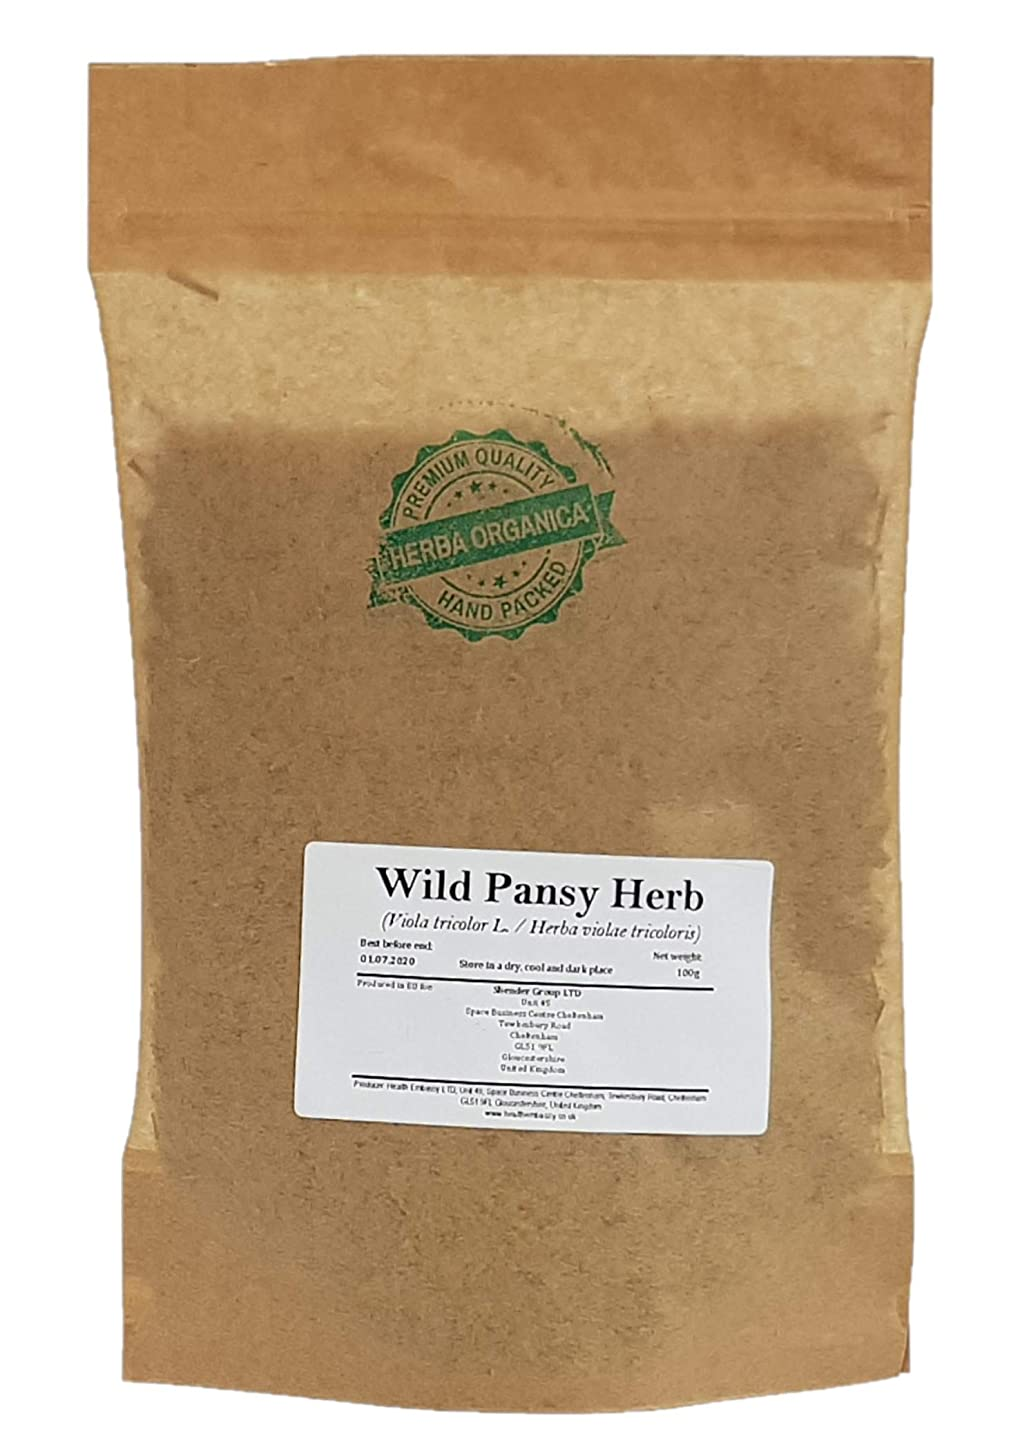 Wild Pansy Herb - Viola Tricolor L # Herba Organica # Johnny Jump Up, Heartsease (100g)